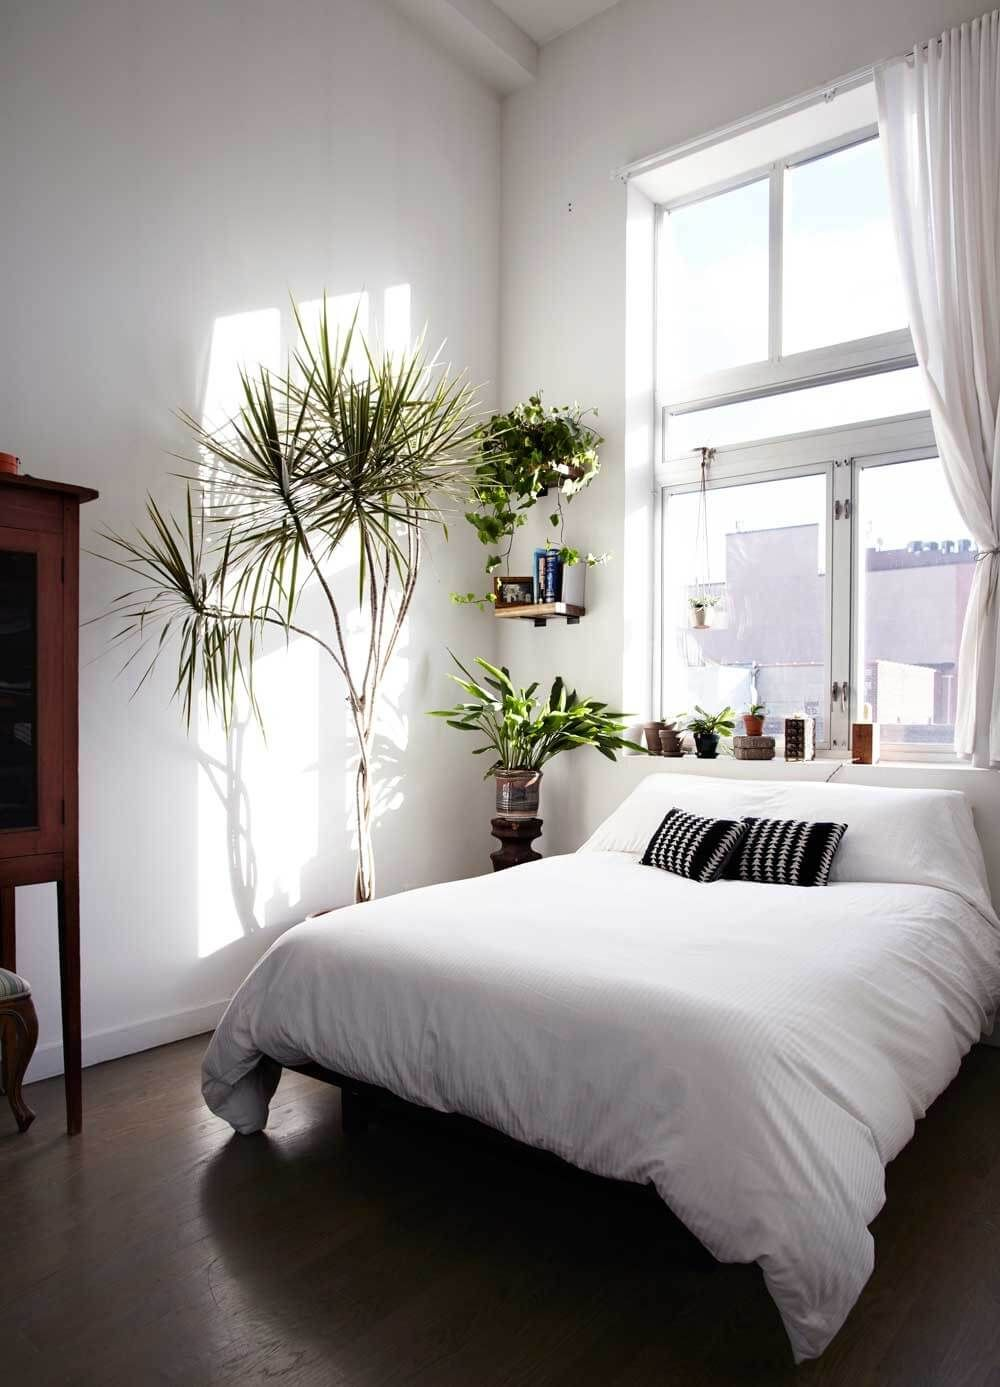 Maisieleblanc dollhaüs inspo pinterest lofts plants and